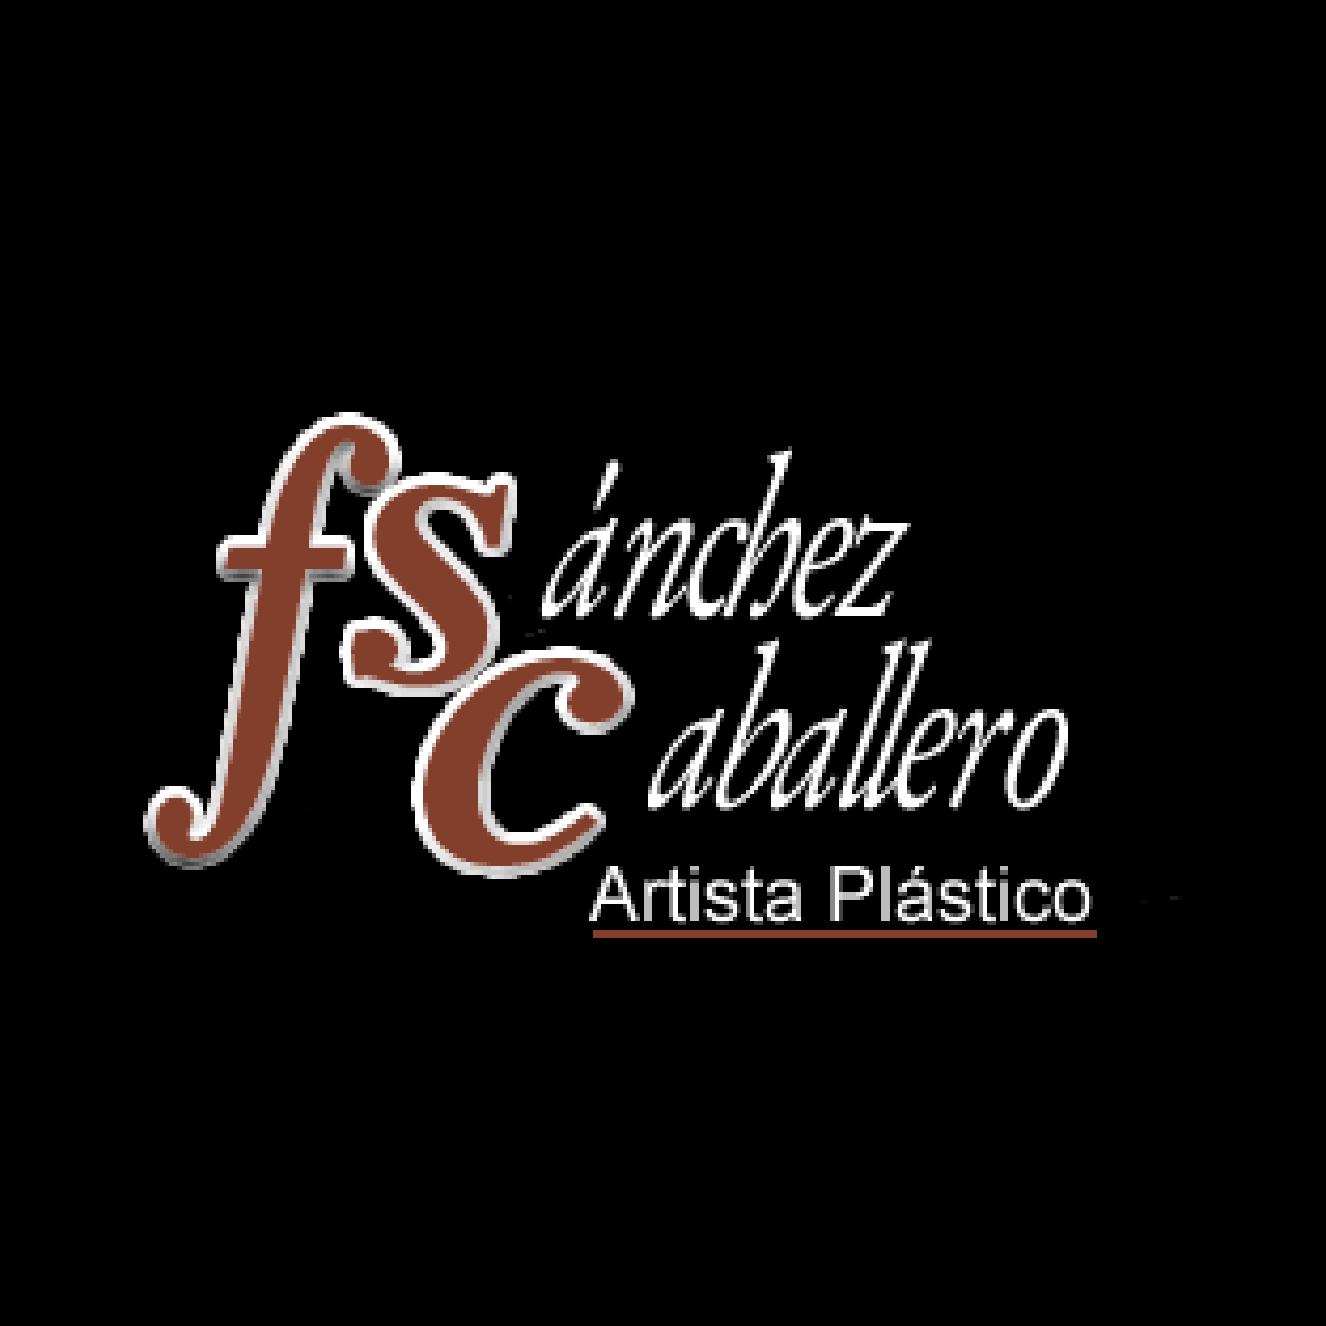 Freddy Sanchez Caballero